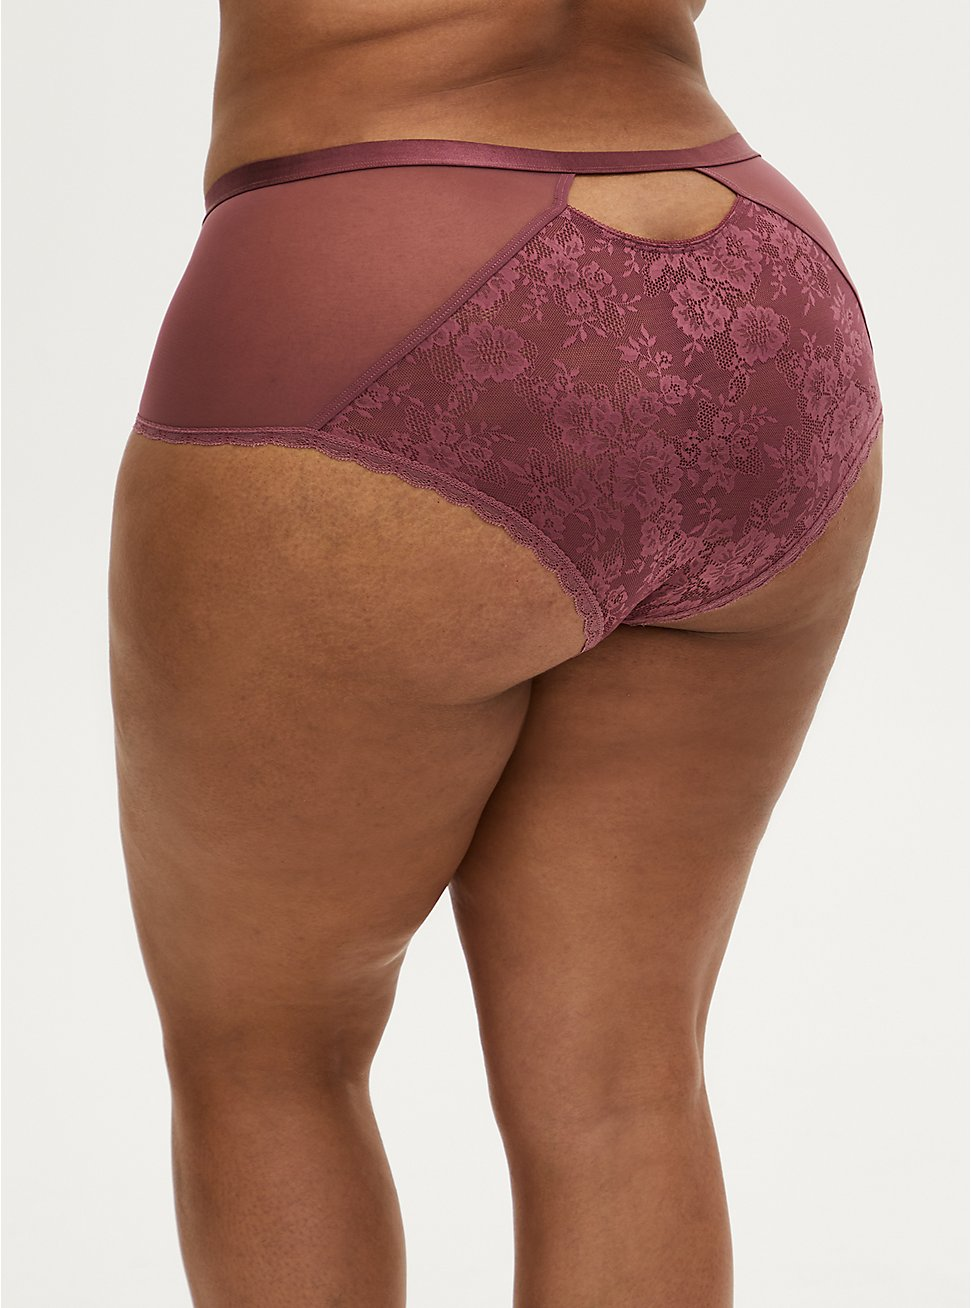 Mauve Purple Lace & Mesh Keyhole Cheeky Panty, DRIED CRANBERRY BURGUNDY, hi-res